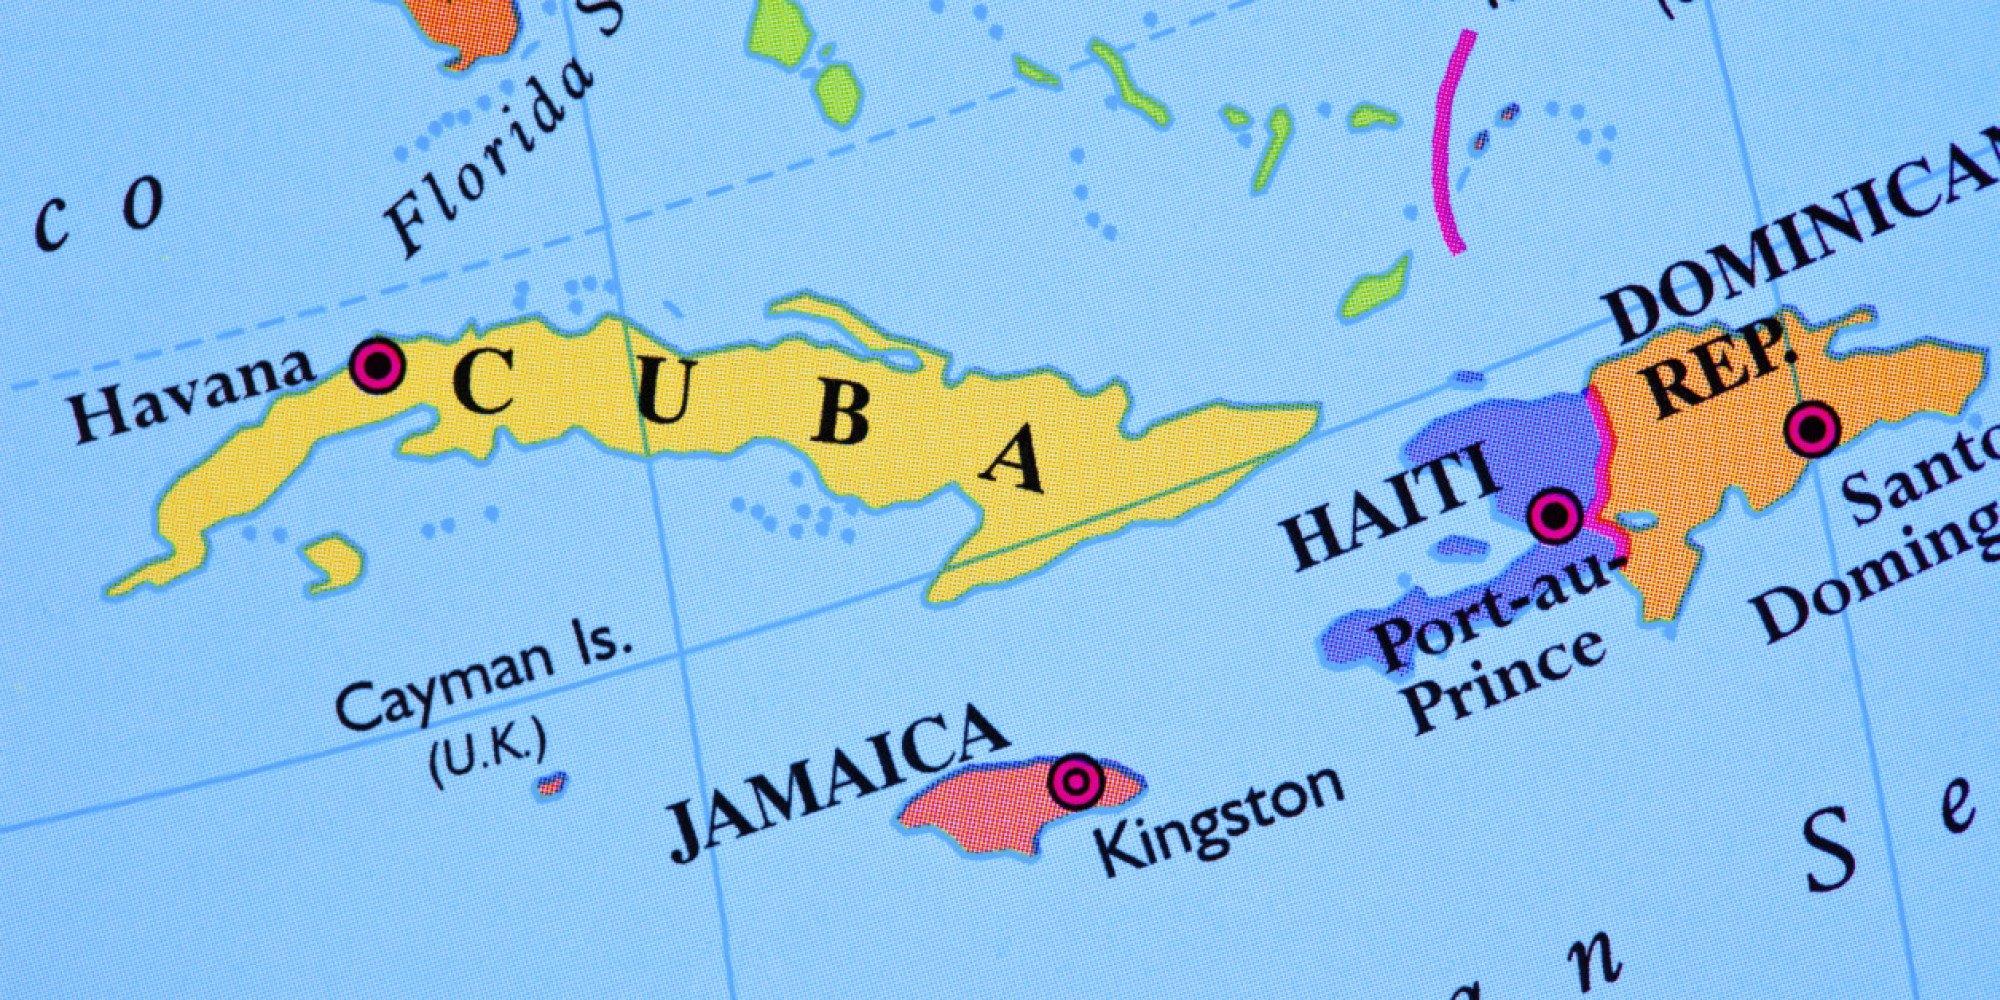 A map of Cuba and Haiti